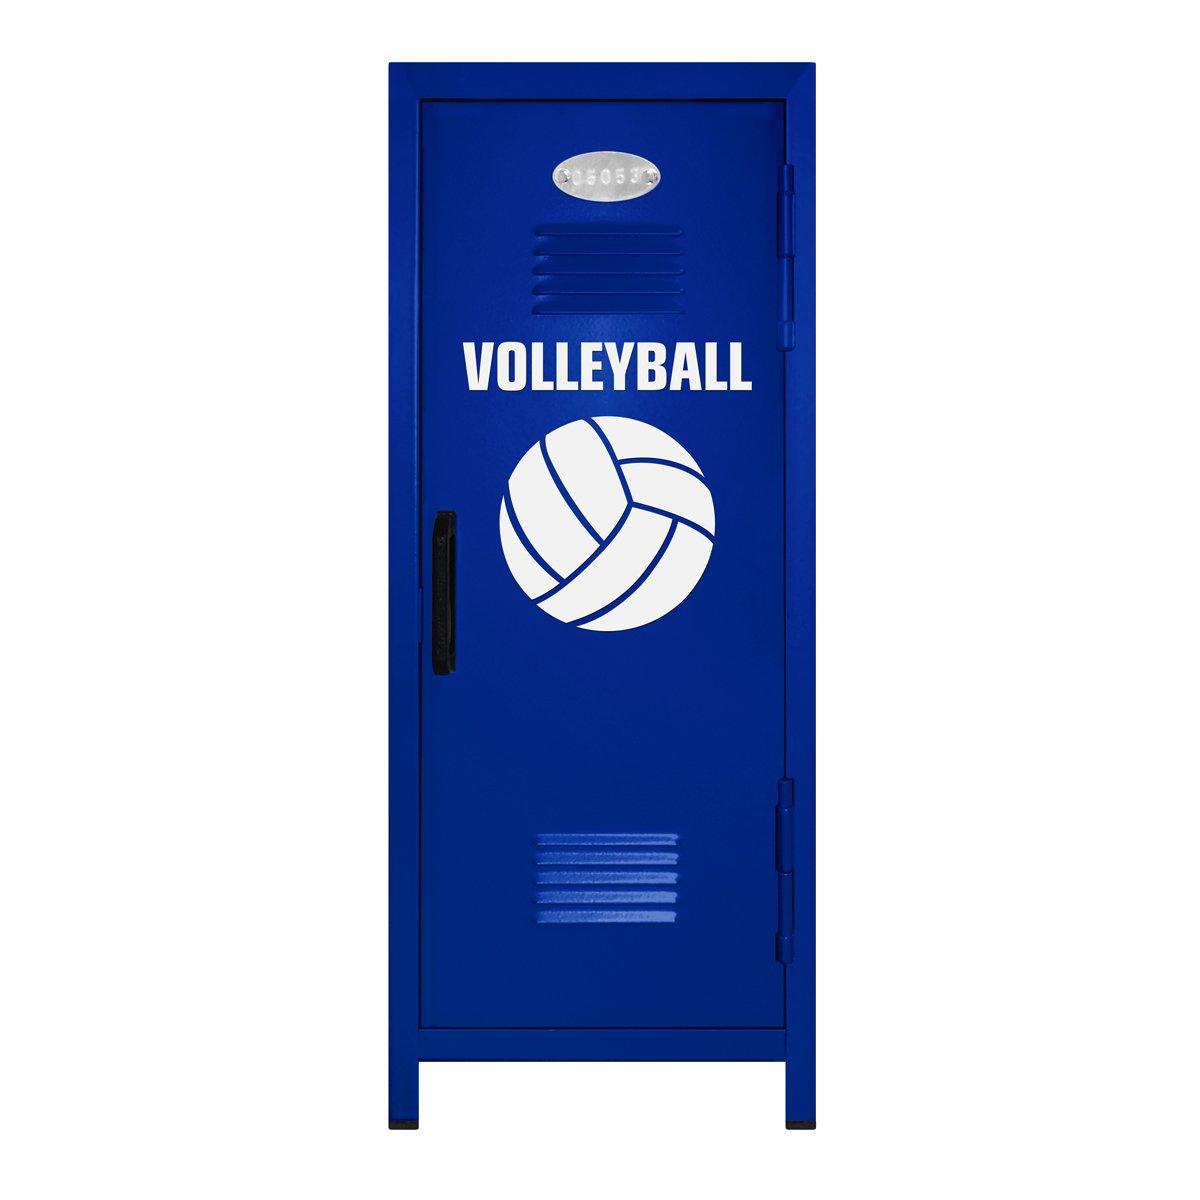 Volleyball Player Miniロッカーギフト  ブルー/ホワイト B00OM7LXMG